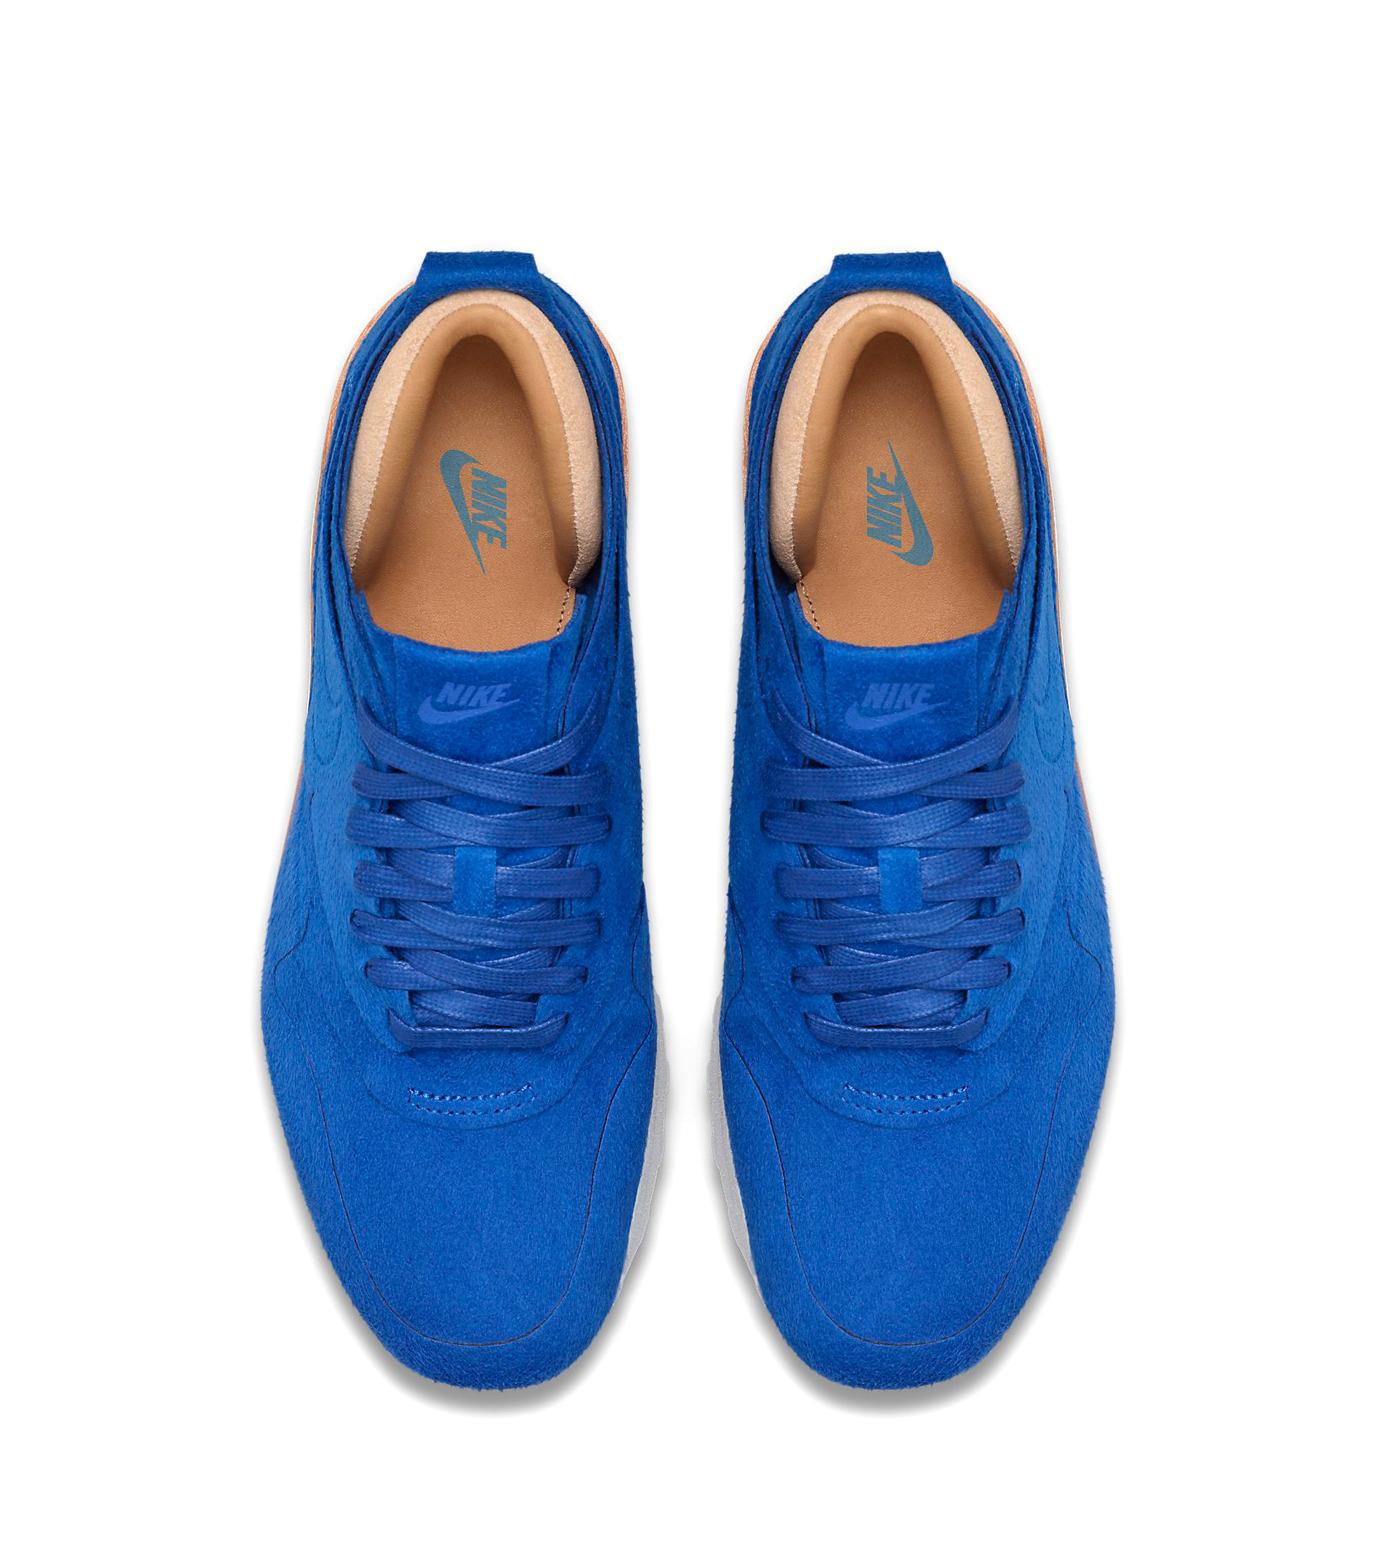 NIKE(ナイキ)のWMNS Air Max 1-BLUE(シューズ/shoes)-847672-400-92 拡大詳細画像4